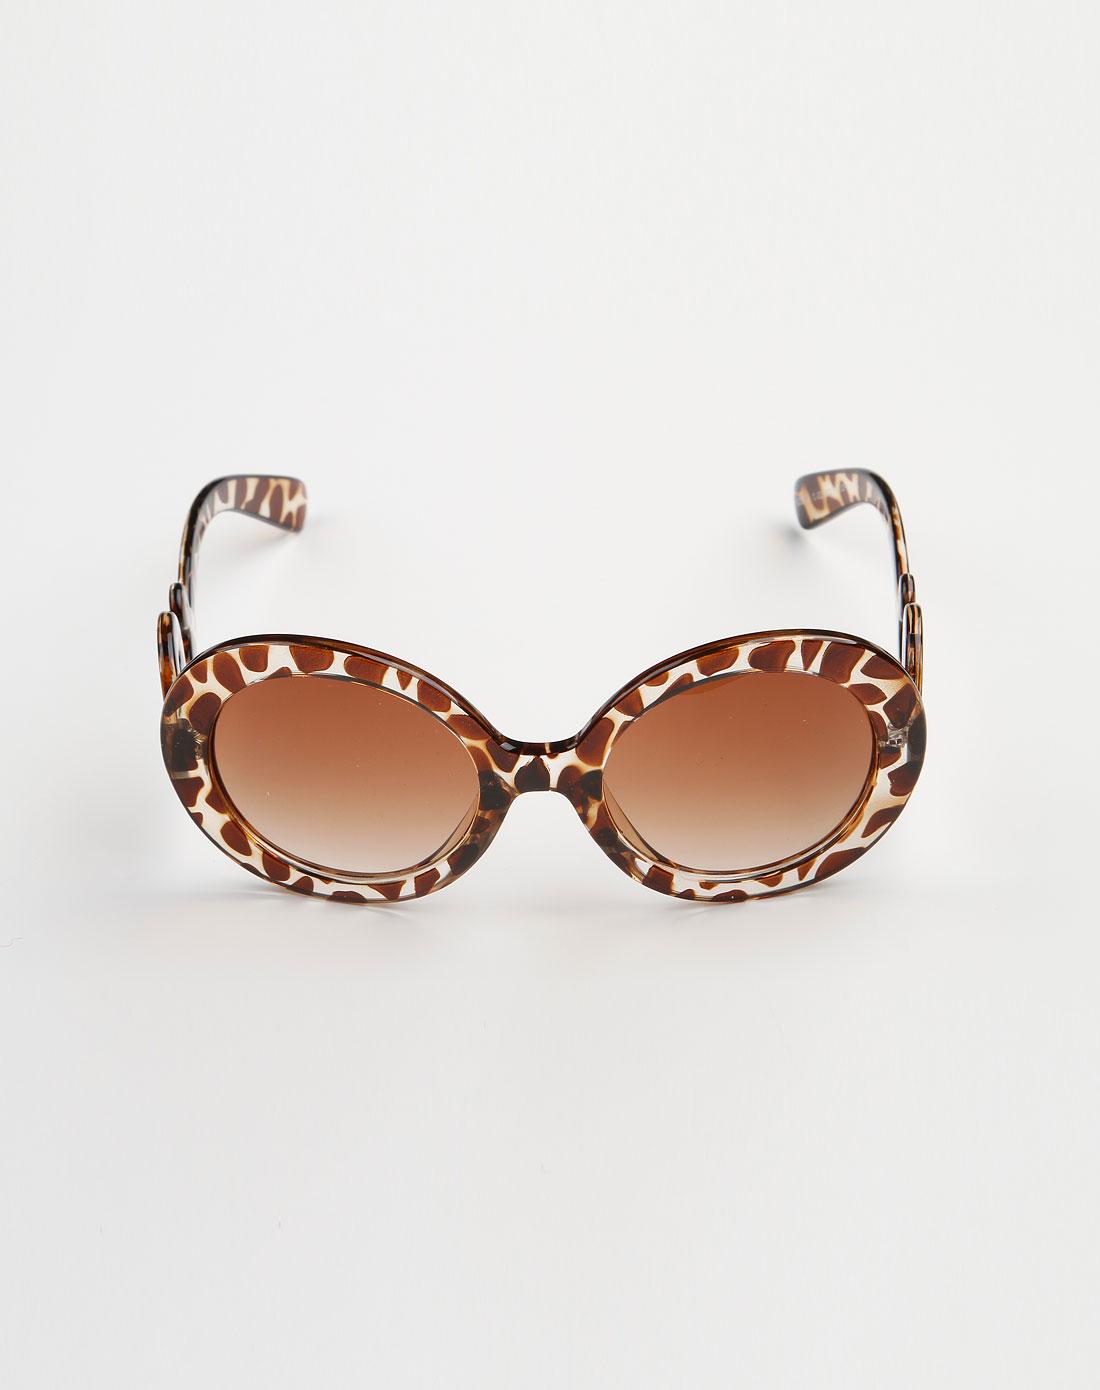 b&balos 深茶/啡色豹纹圆形可爱眼镜